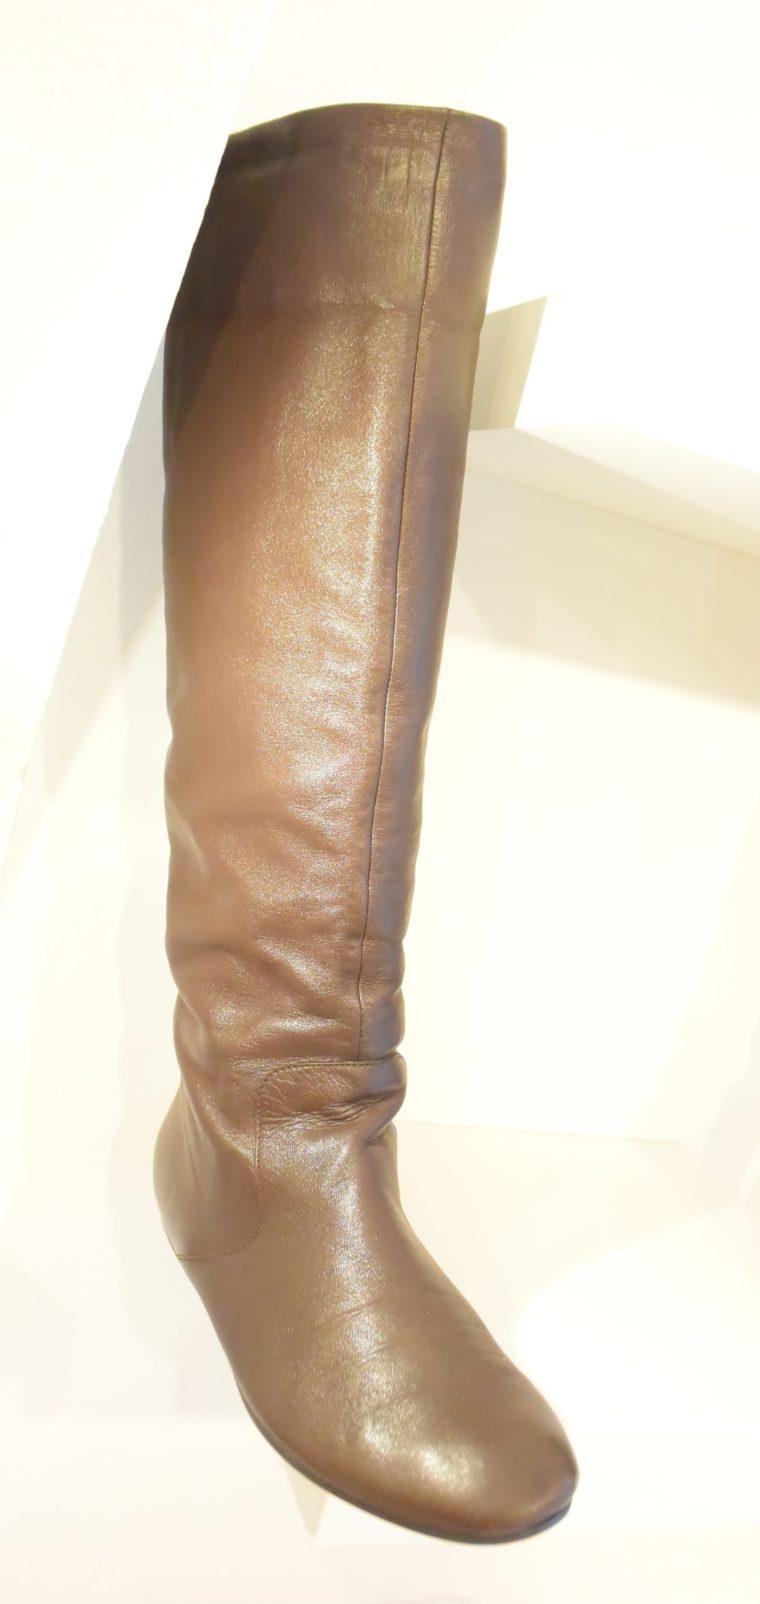 Gucci Stiefel braun Leder 38 -13406